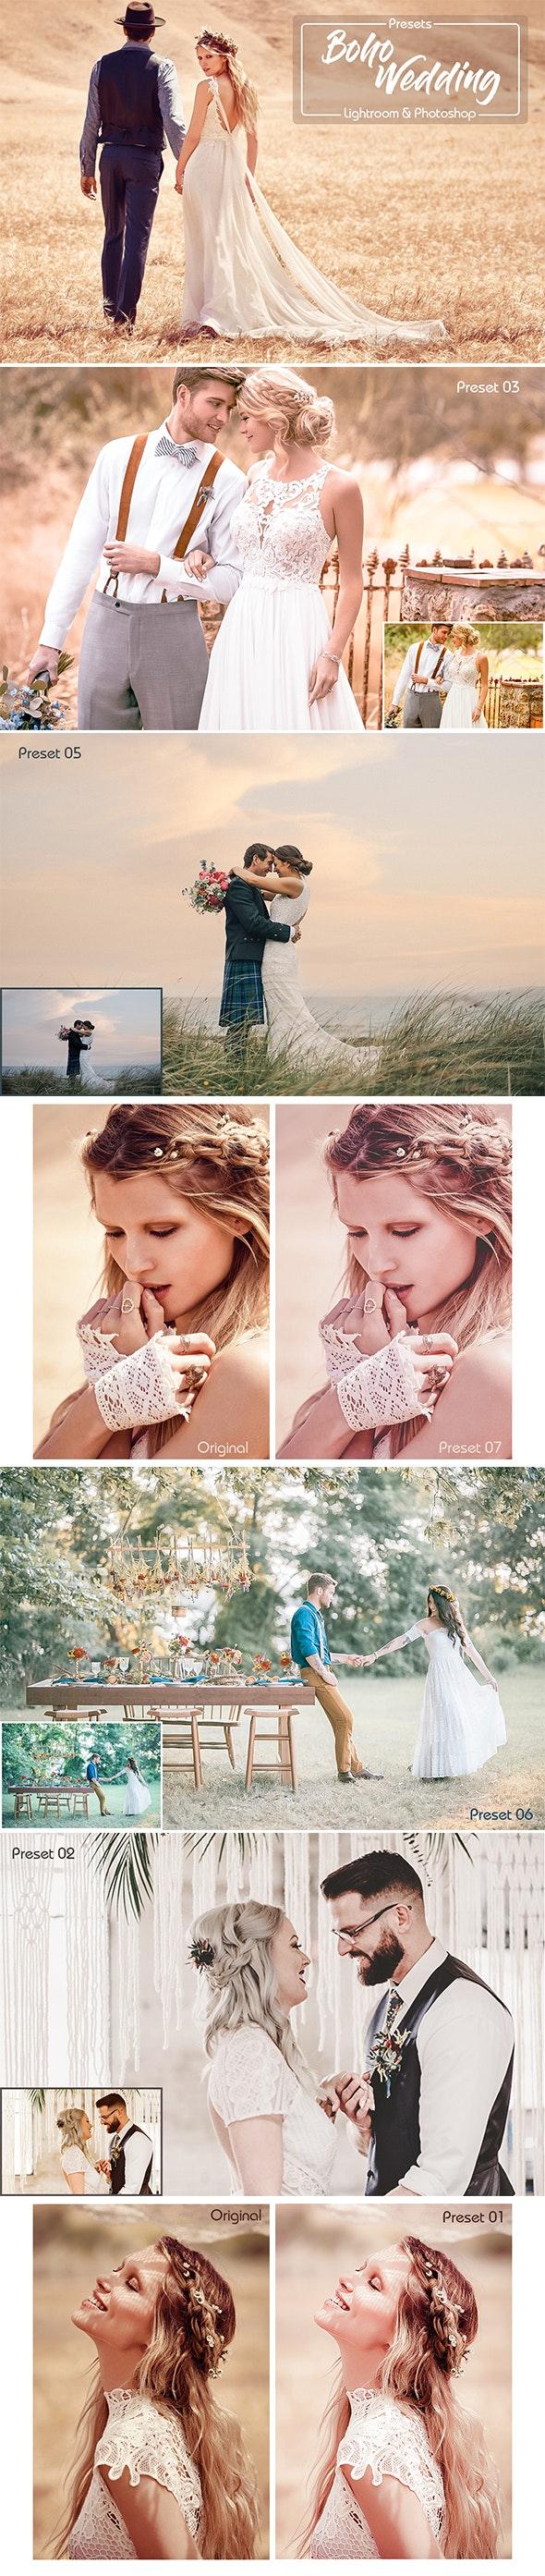 Boho Wedding Lightroom Presets & Photoshop Filters ACR by